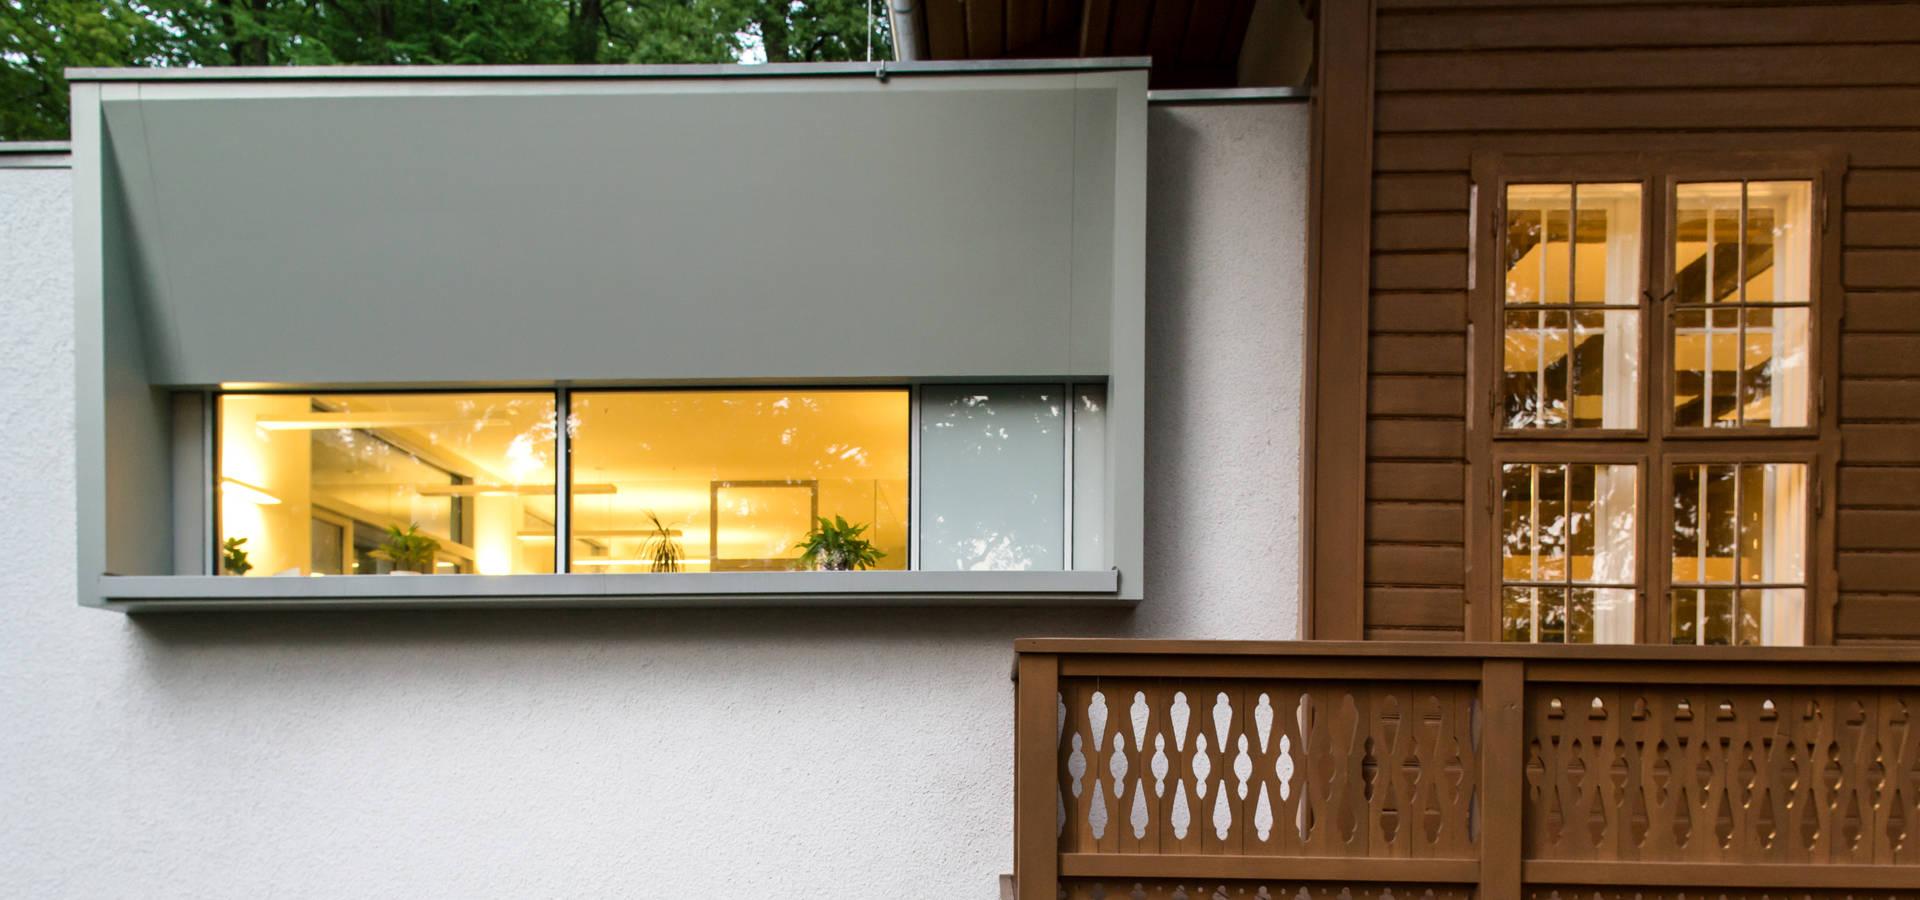 Architektin DI Ulrike Wallnöfer